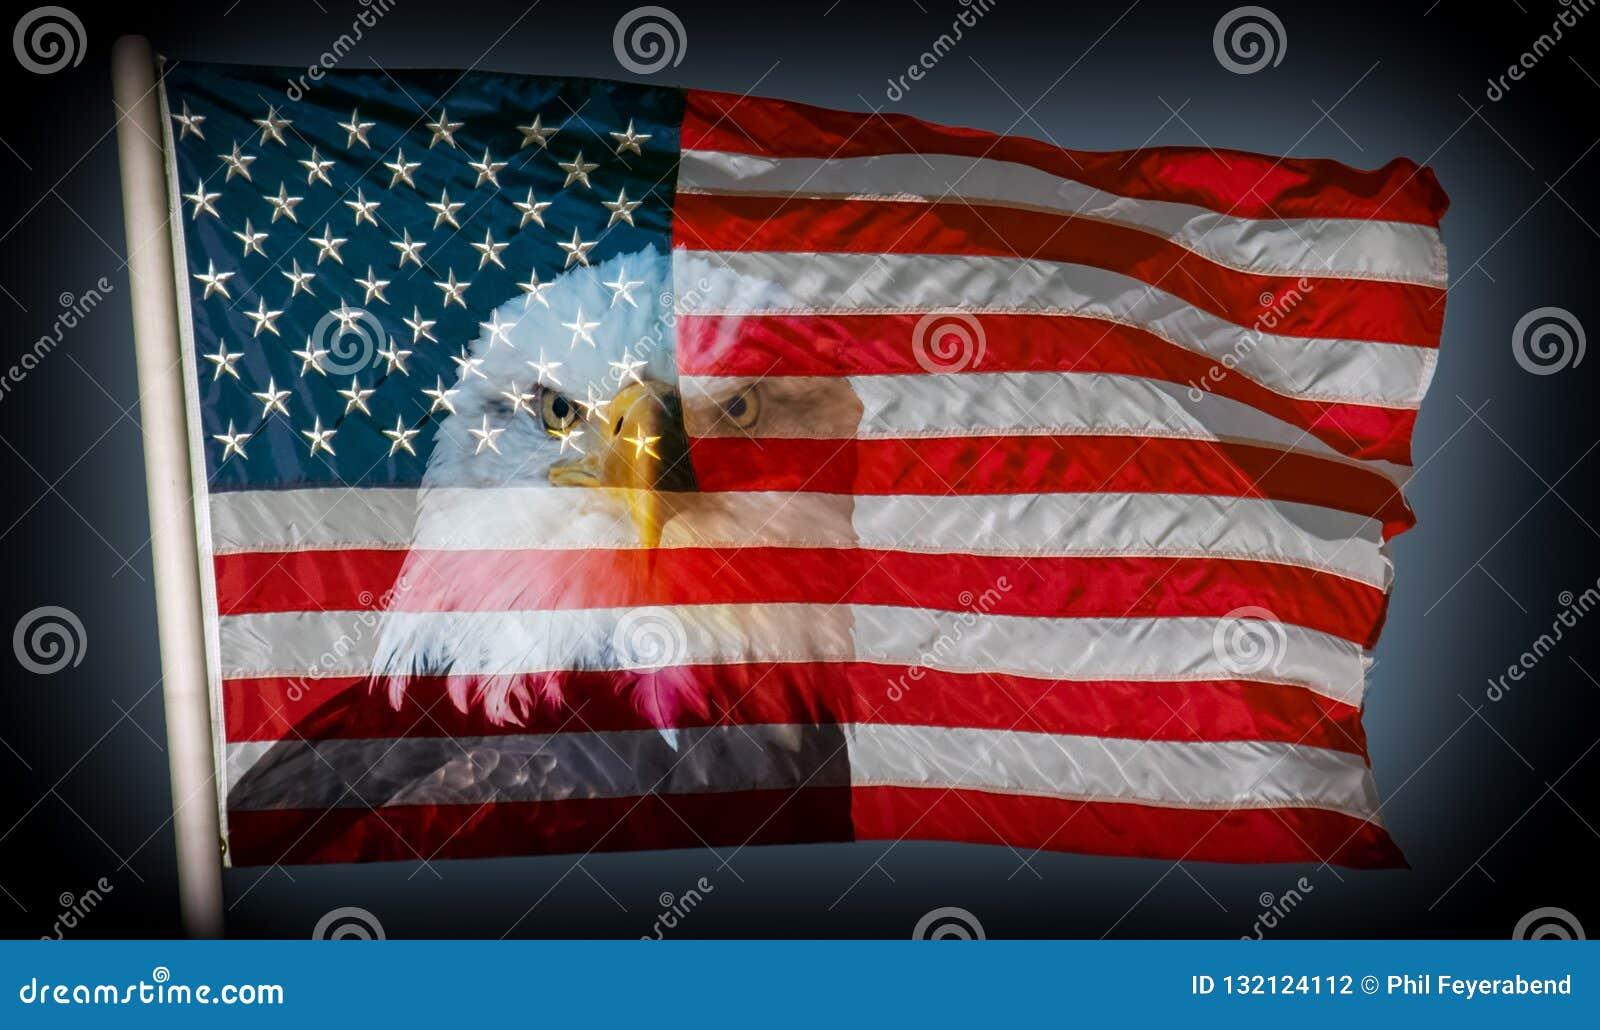 Altijd waakzame Amerikaanse vlag en kale adelaars donkere achtergrond